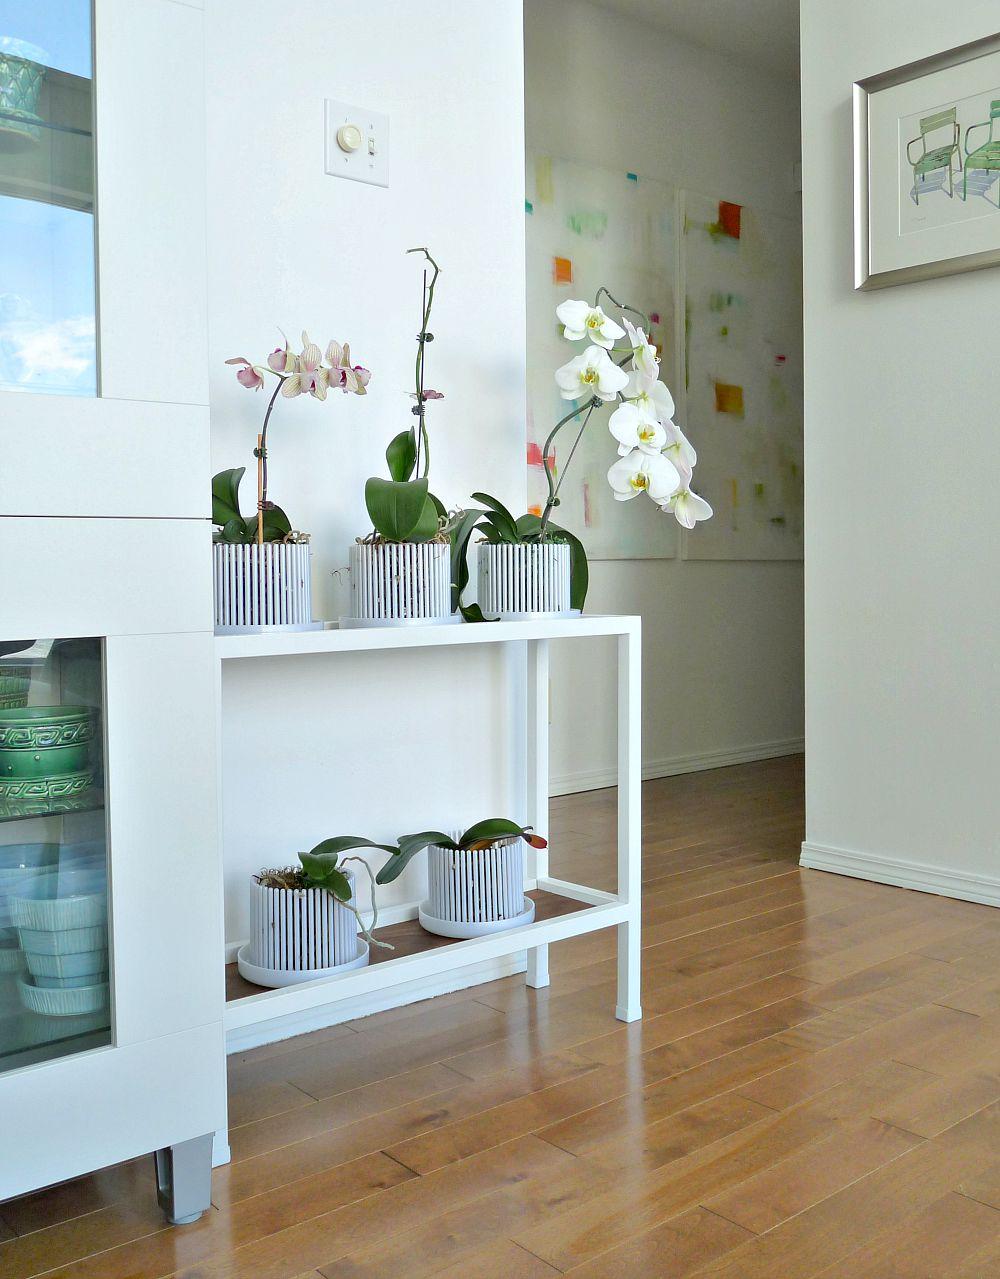 Planter with Walnut Shelves